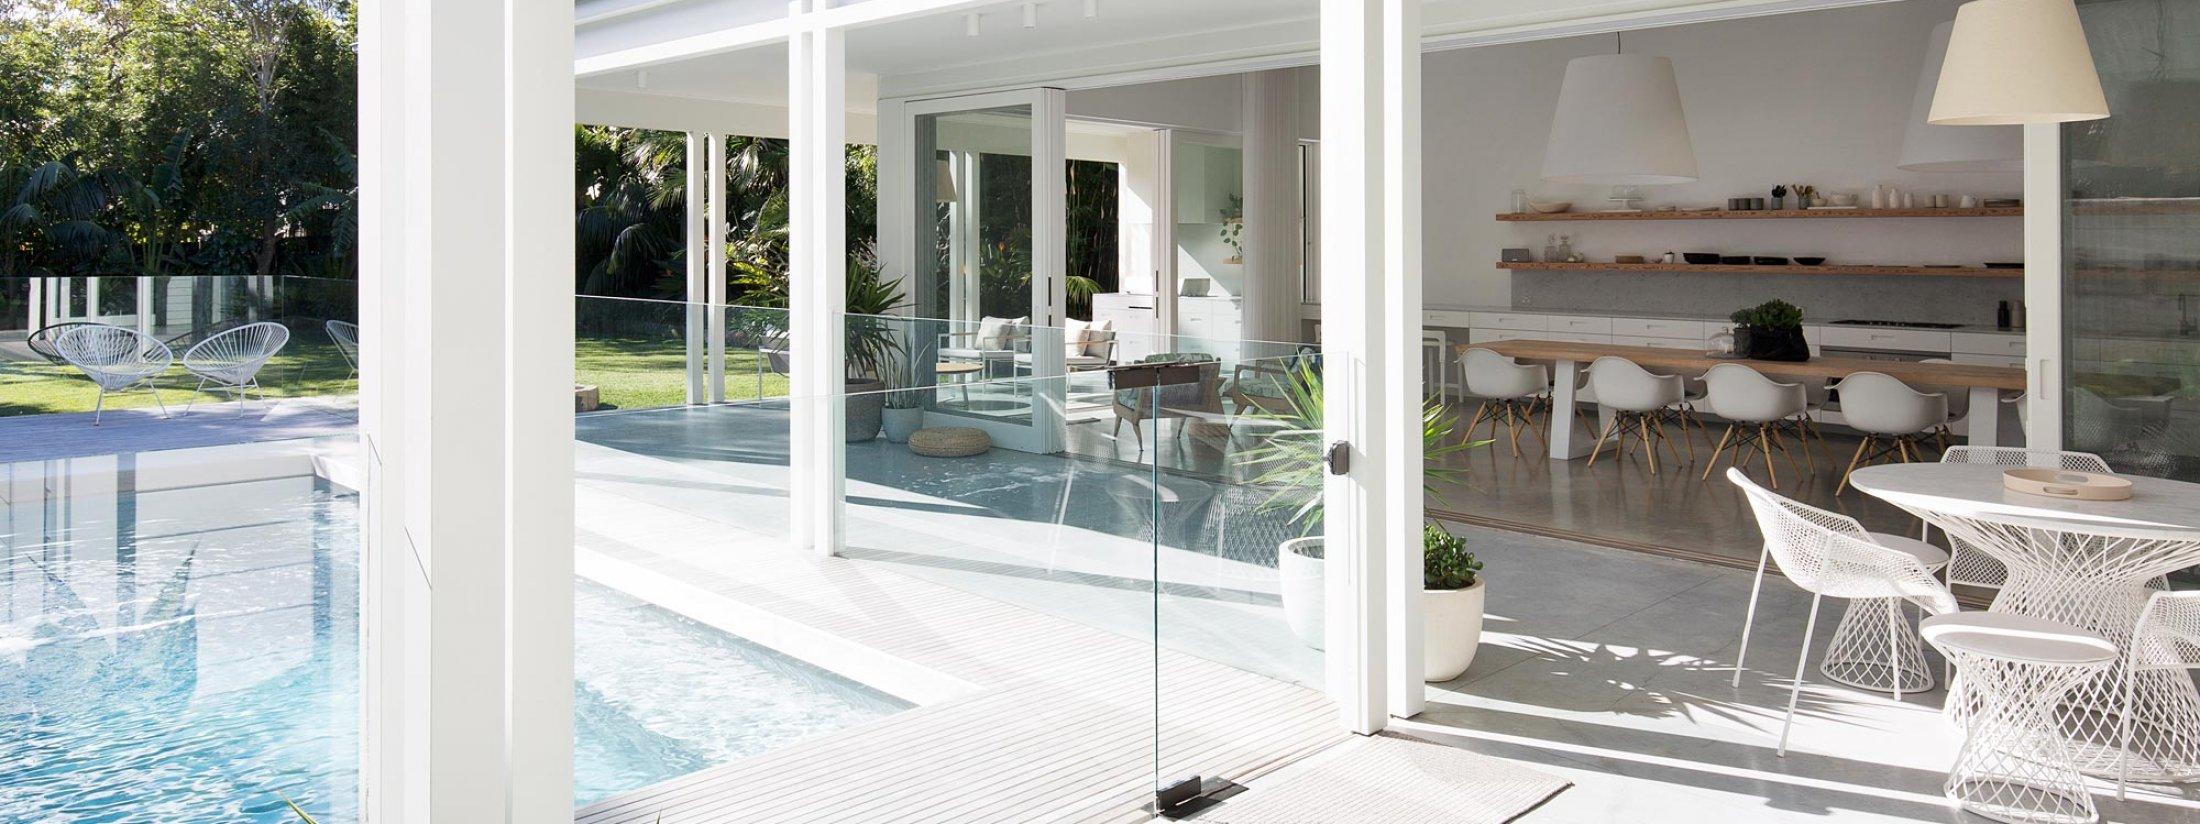 Coonanga Beach House - Avalon - Open Plan Indoor and Outdoor Flow